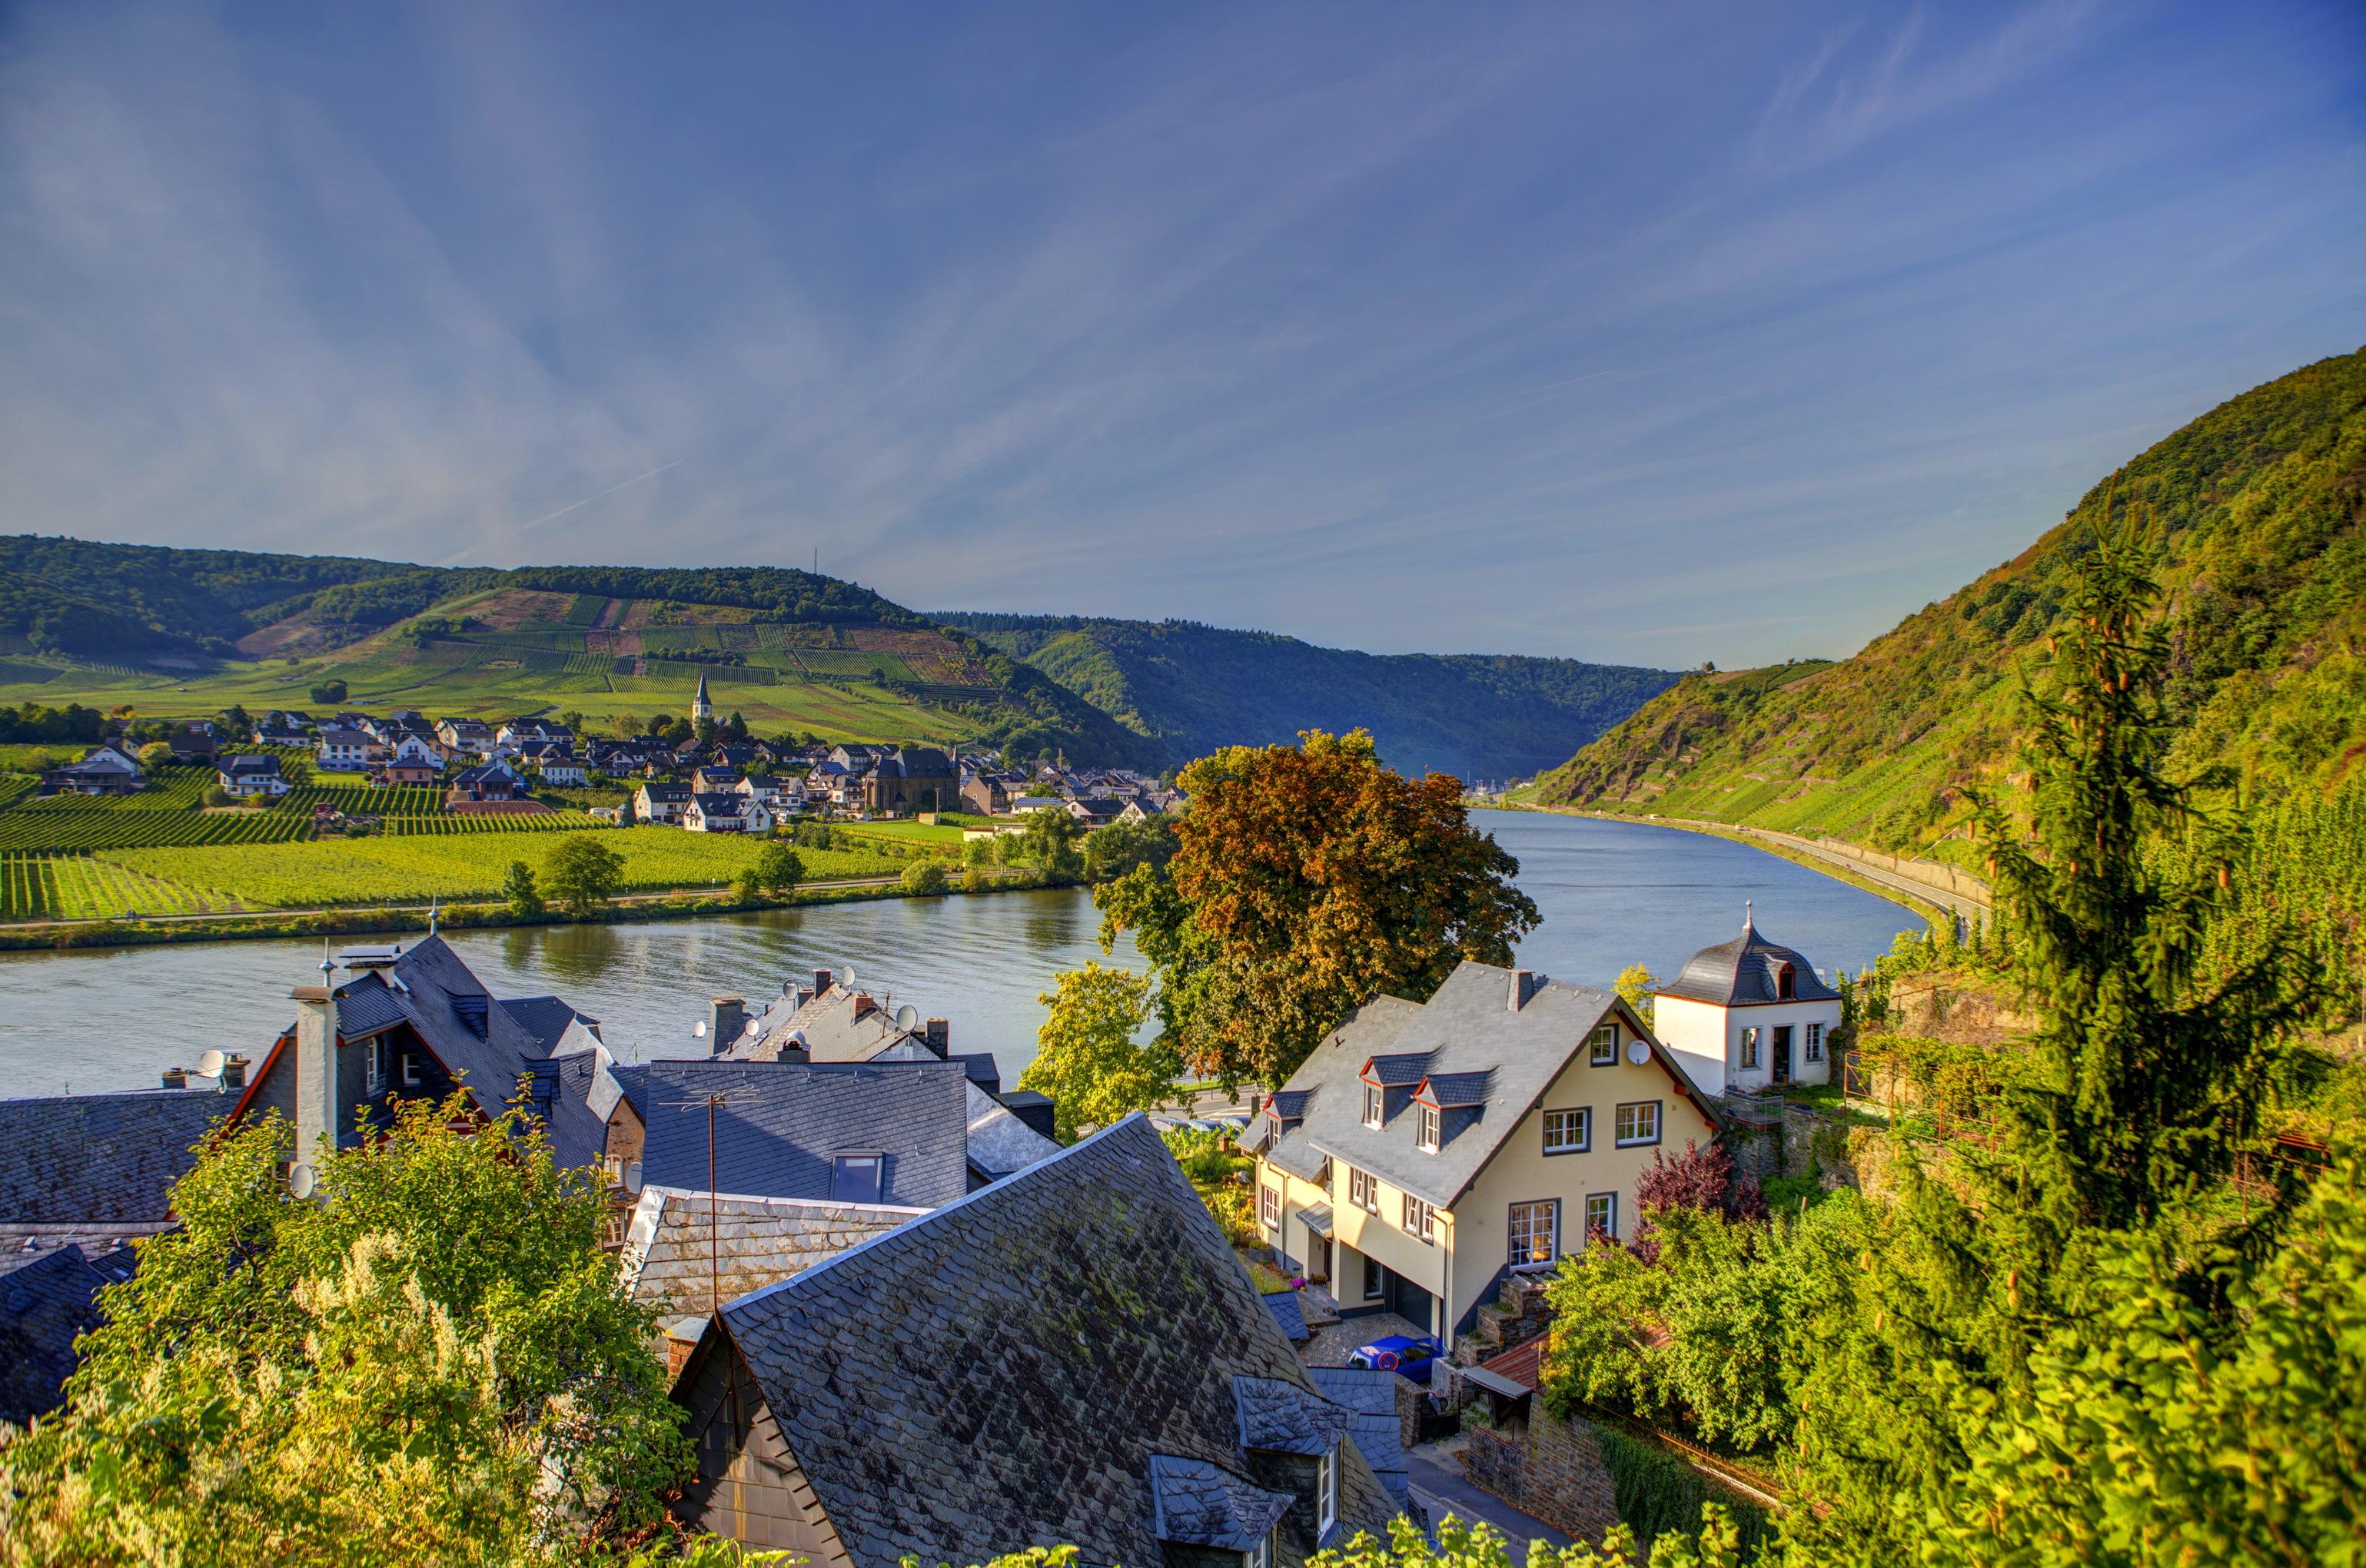 Lorch Village, Hesse, Rhine River, Germany  № 78253  скачать